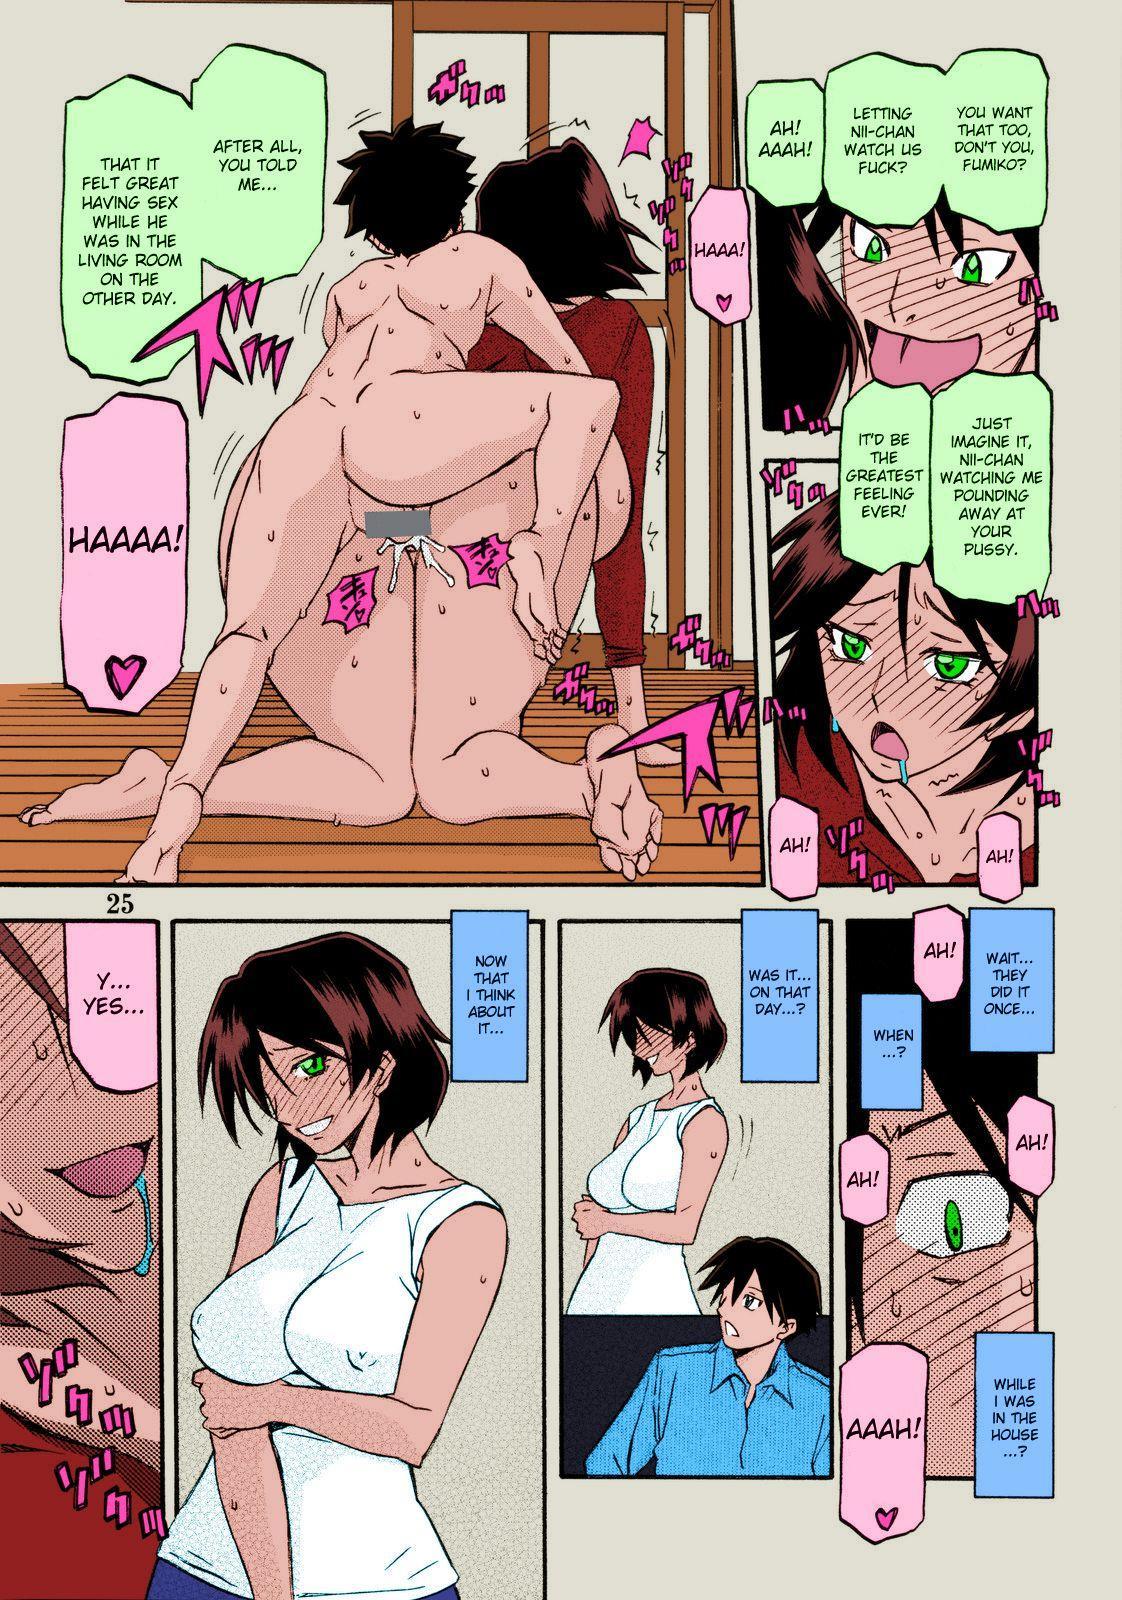 Akebi no Mi - Fumiko 24